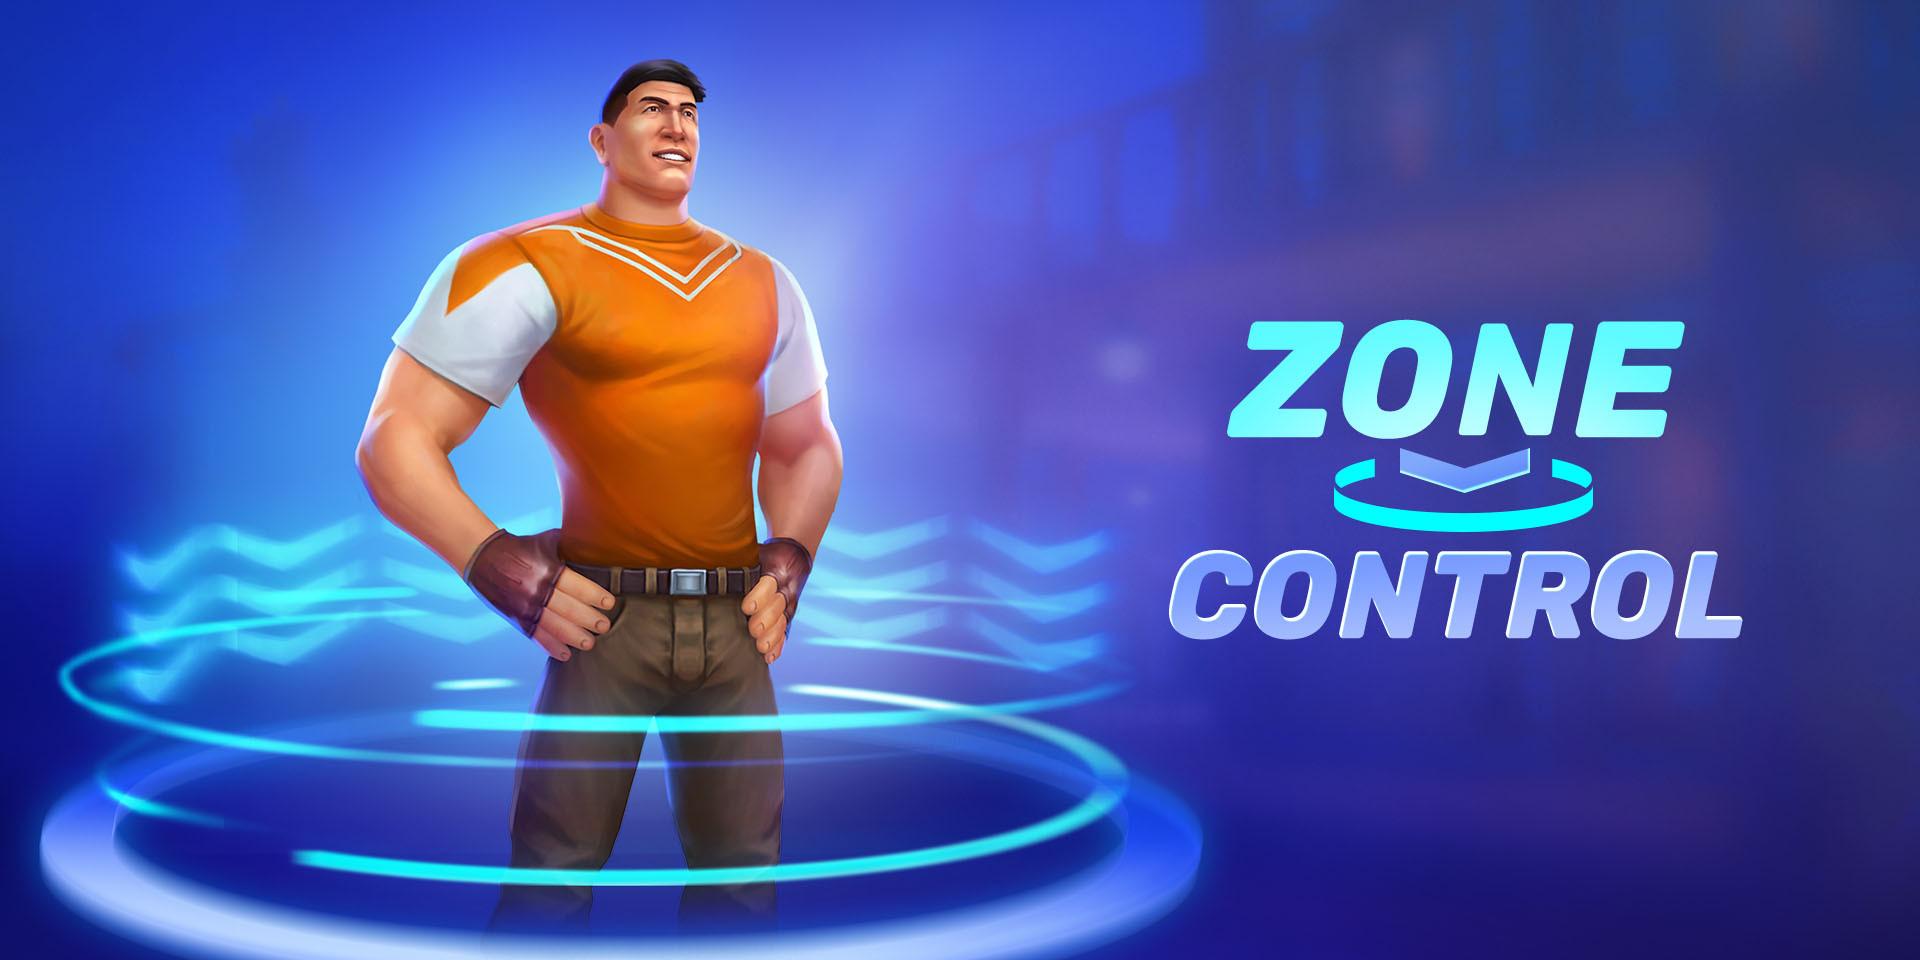 zone-control-tpV6jfbE8p